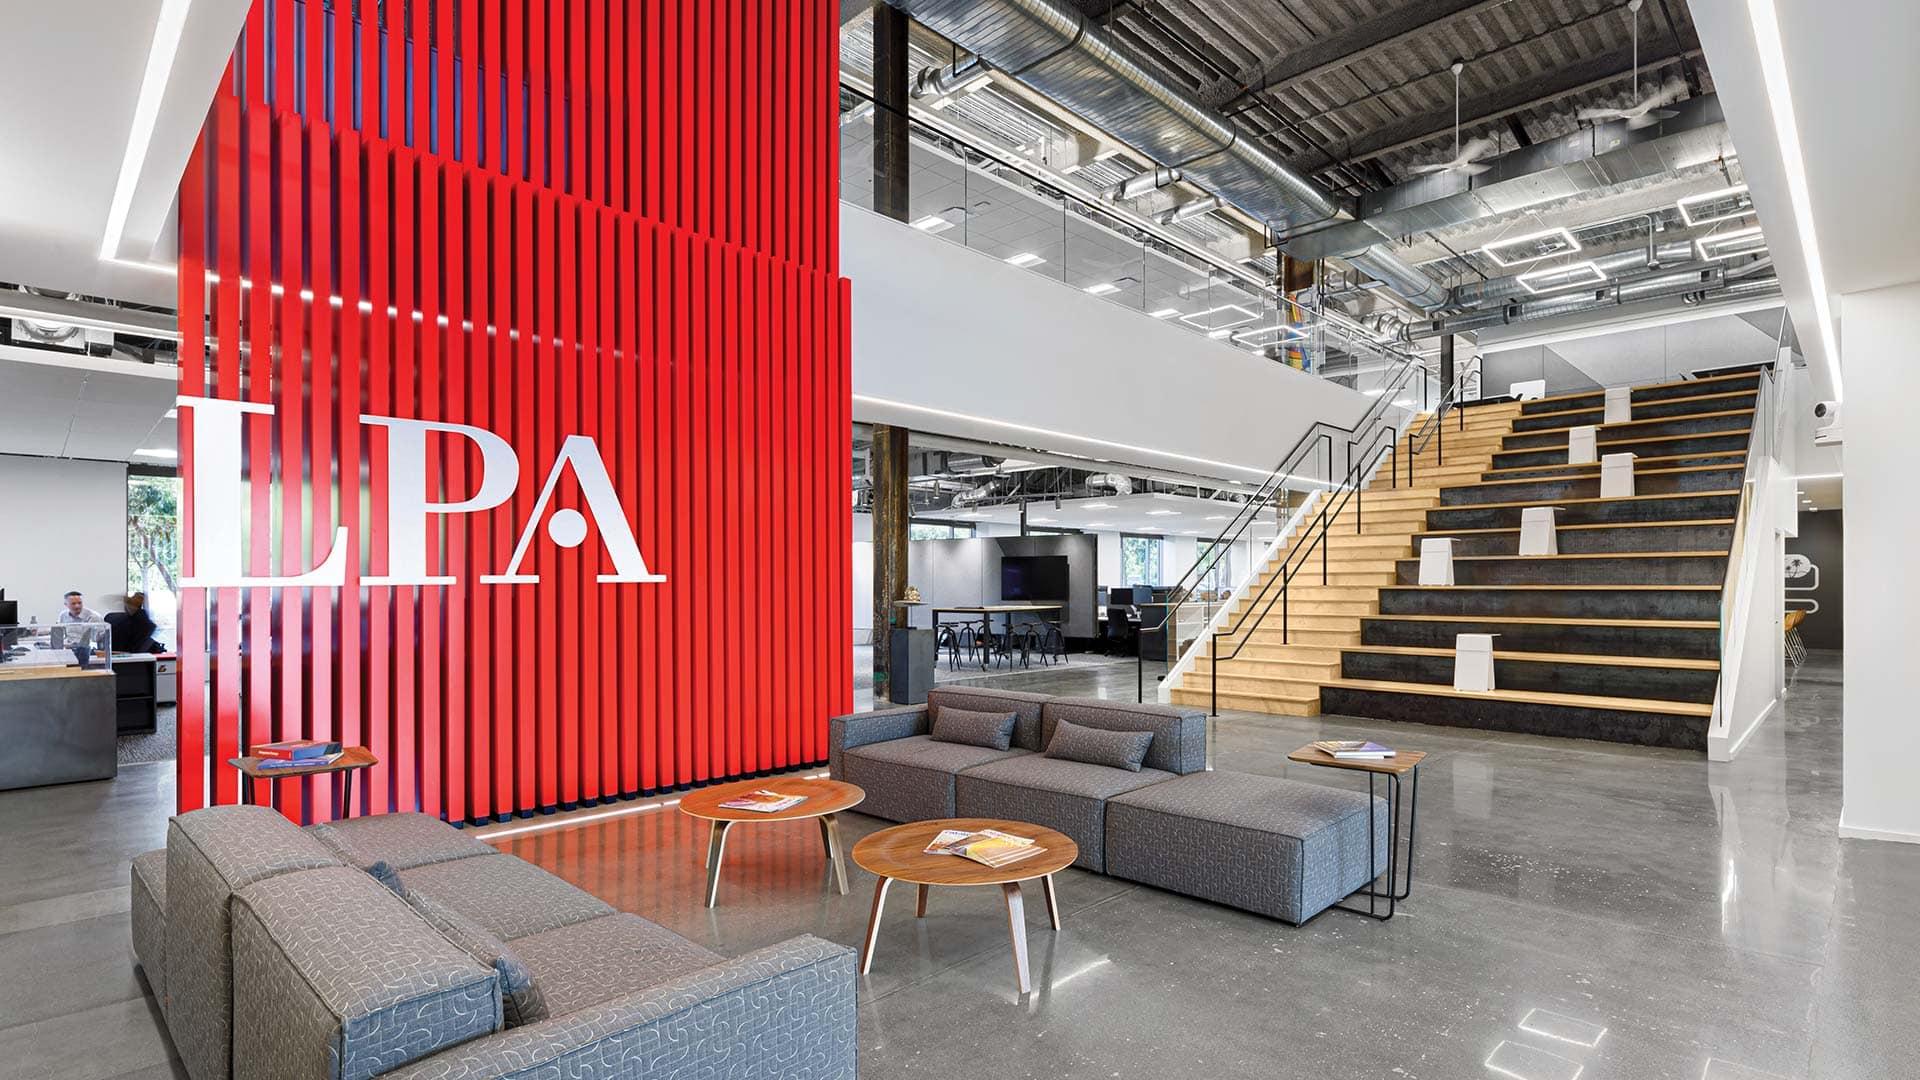 A Light LPA IRVINE OFFICE HEADQUARTERS